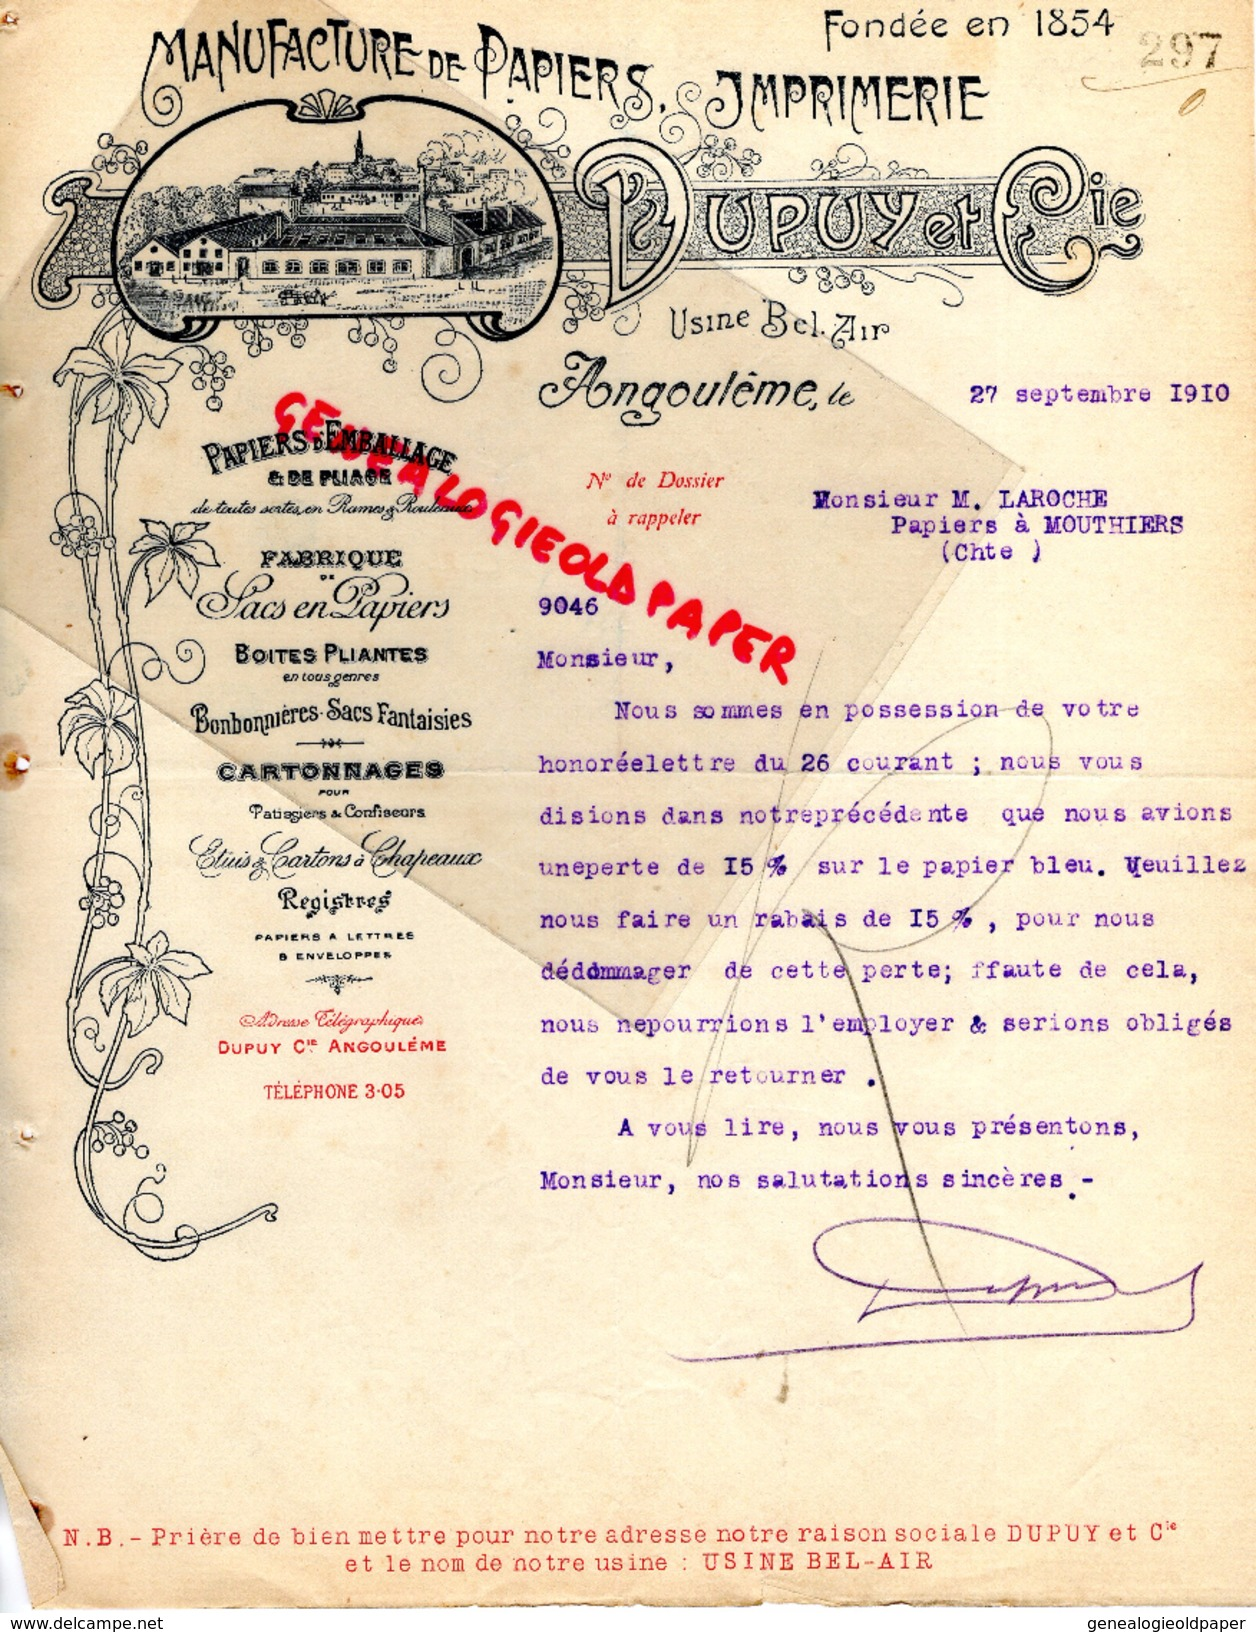 16 - ANGOULEME - FACTURE MANUFACTURE PAPIERS PAPETERIE IMPRIMERIE-DUPUY -USNE BEL AIR- 1910 M. LAROCHE A MOUTHIERS - Papeterie